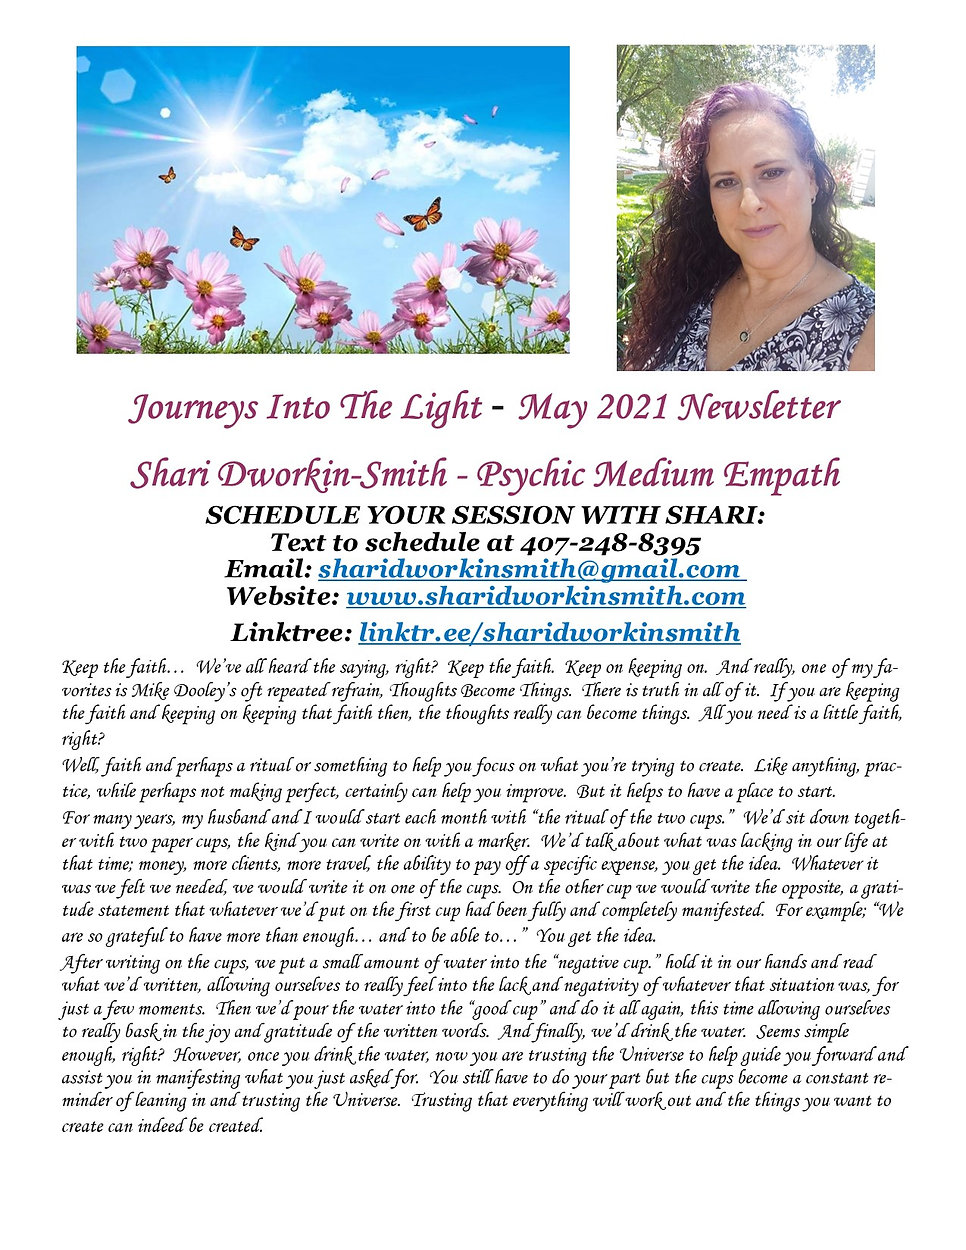 SDS - PME Newsletter - May 2021 -1.jpg